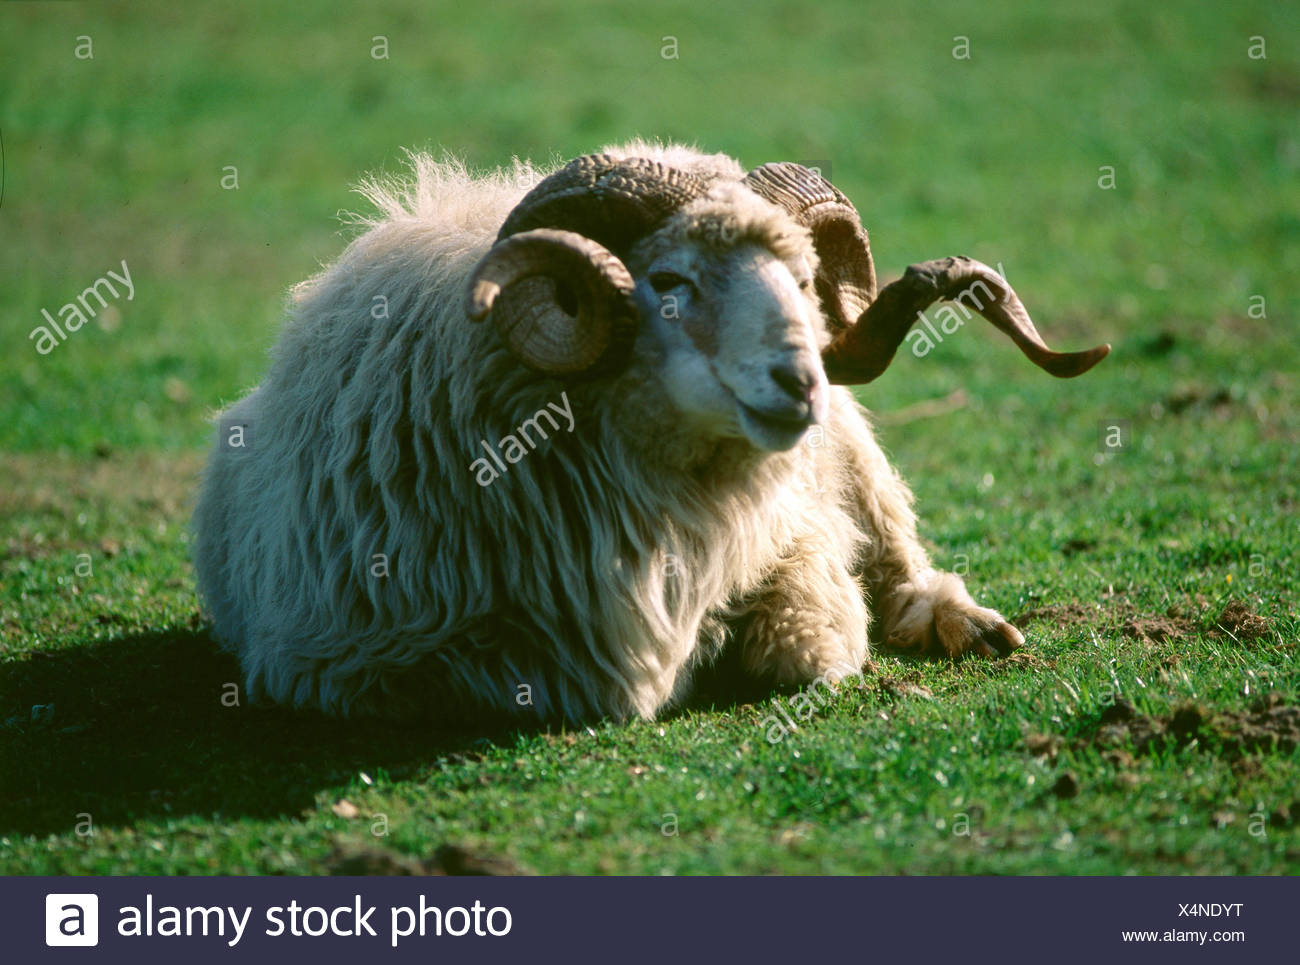 zoology / animals, mammal / mammalian, sheep, (Ovis), Walachian sheep, lying on meadow, distribution: Slovakia, Czech Republic, - Stock Image